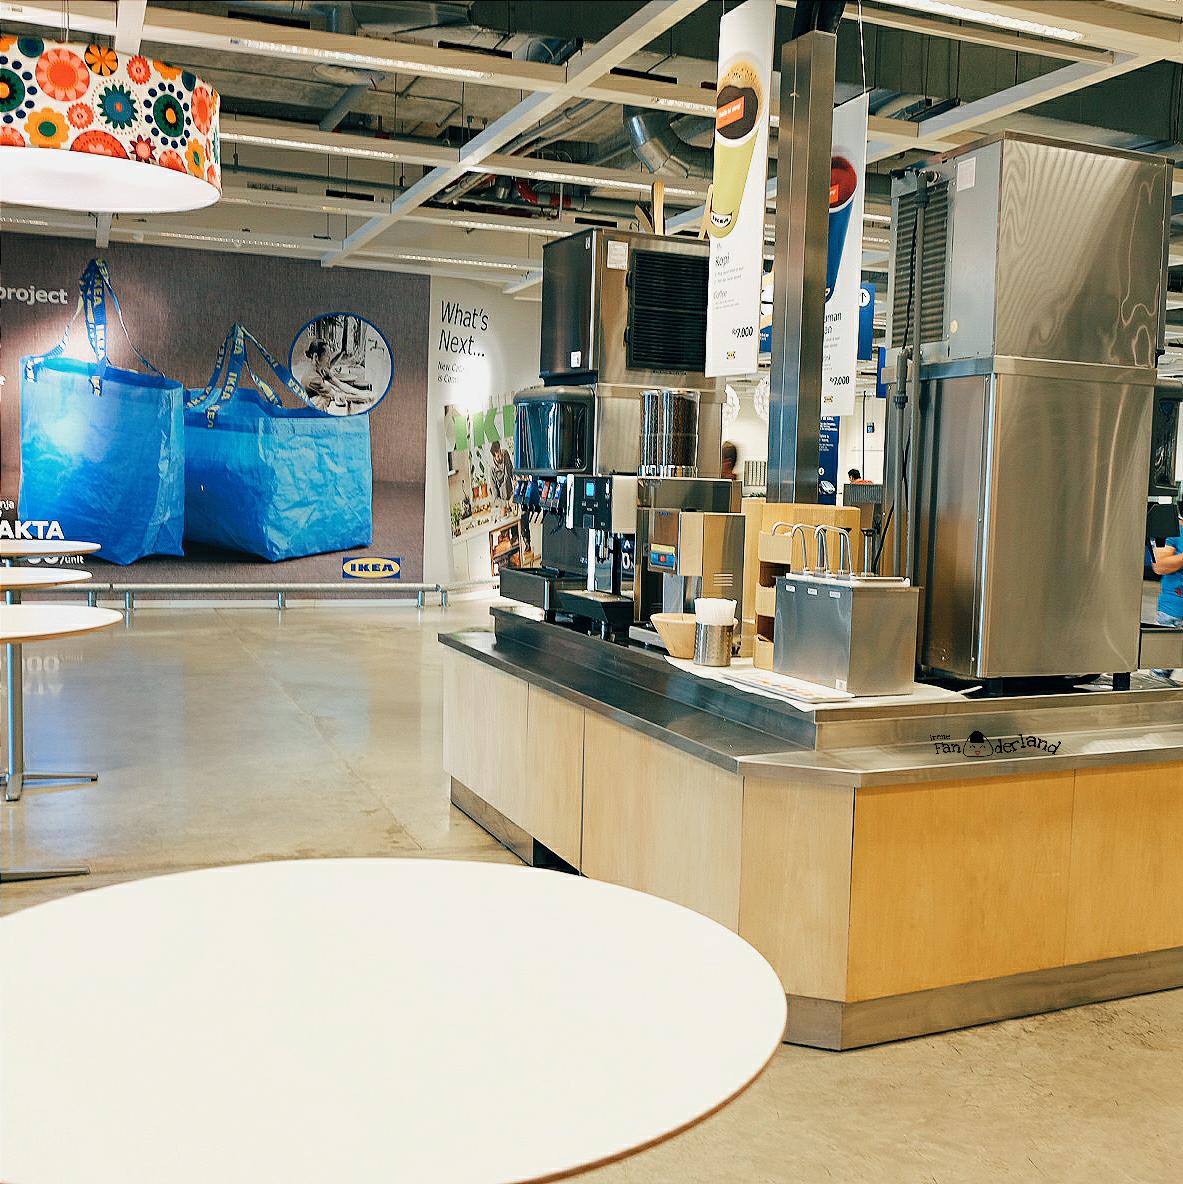 Ikea Indonesia Alam Sutera Tangerang: Irene Fan's Wonderland!: IKEA Indonesia